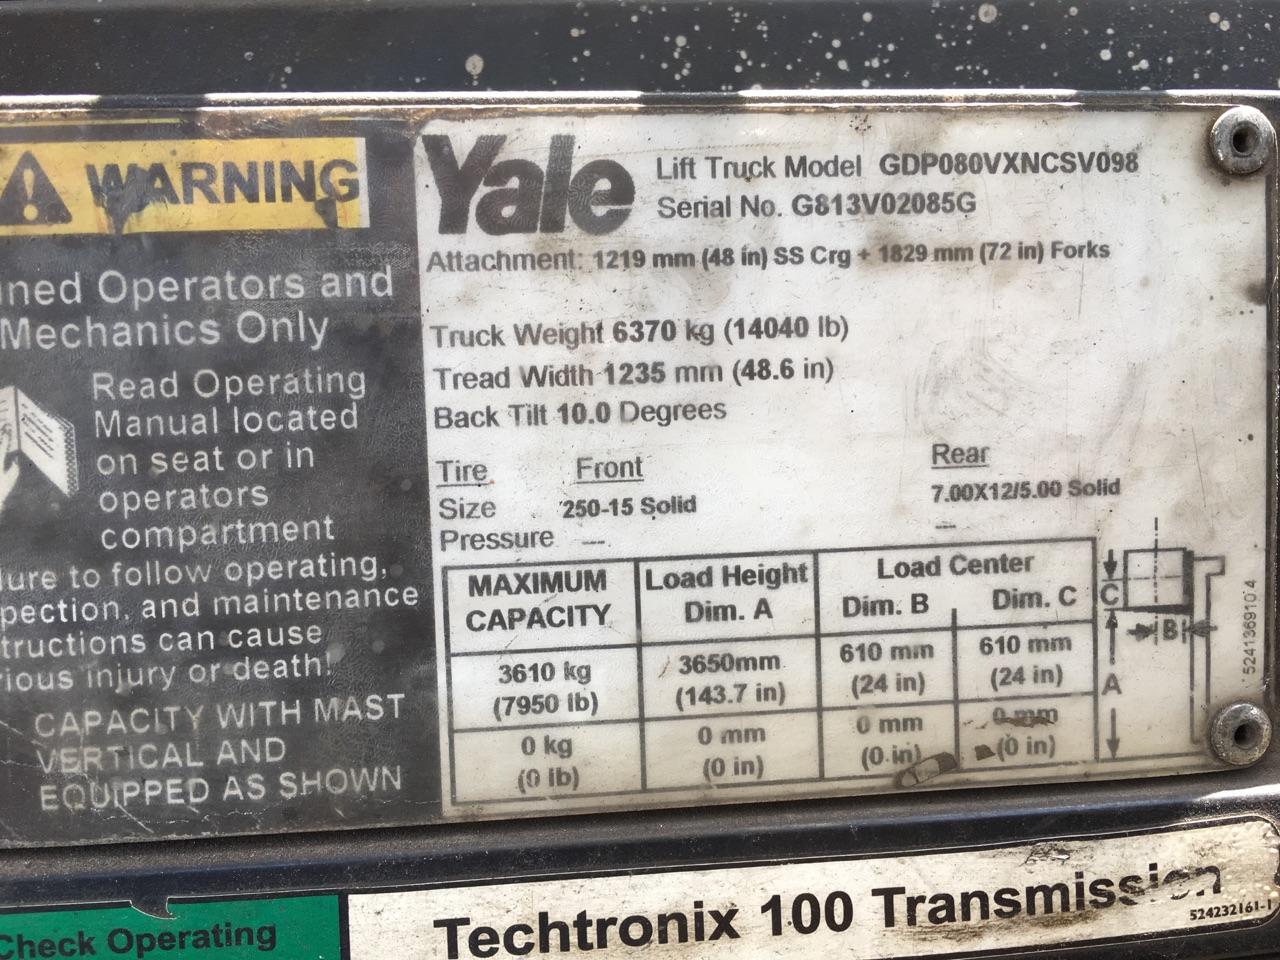 "Lot 18 - YALE 8,000 LB. CAP. MDL. GDP080VXNCSV098 FORKLIFT, 2-stage mast, 143"" max. lift ht., side shift,"